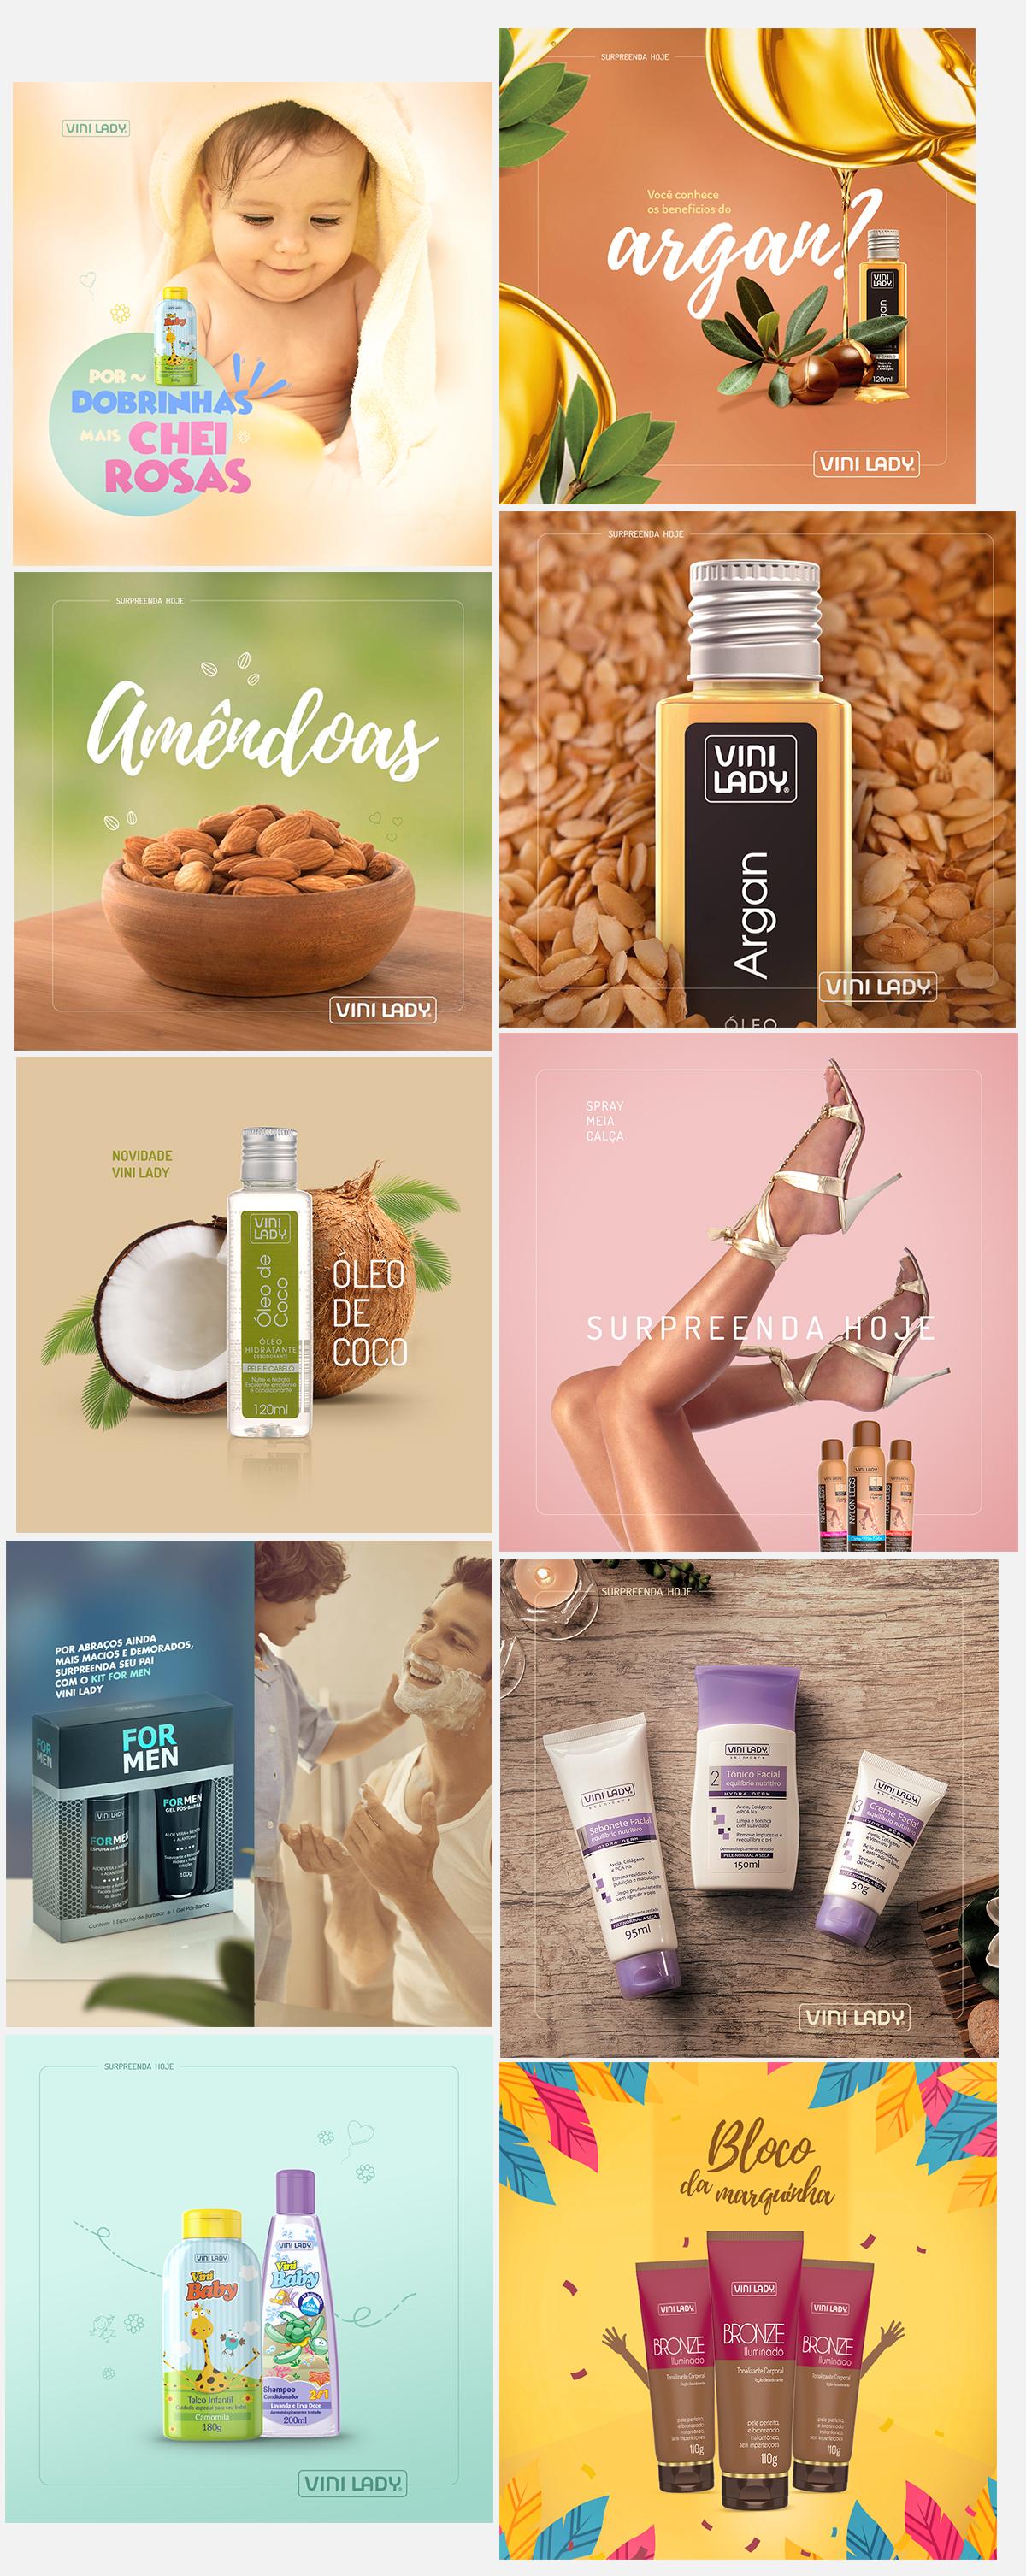 post facebook toyz propaganda agencia vini lady cosmeticos perfumes femininos marketing qualidade melhor